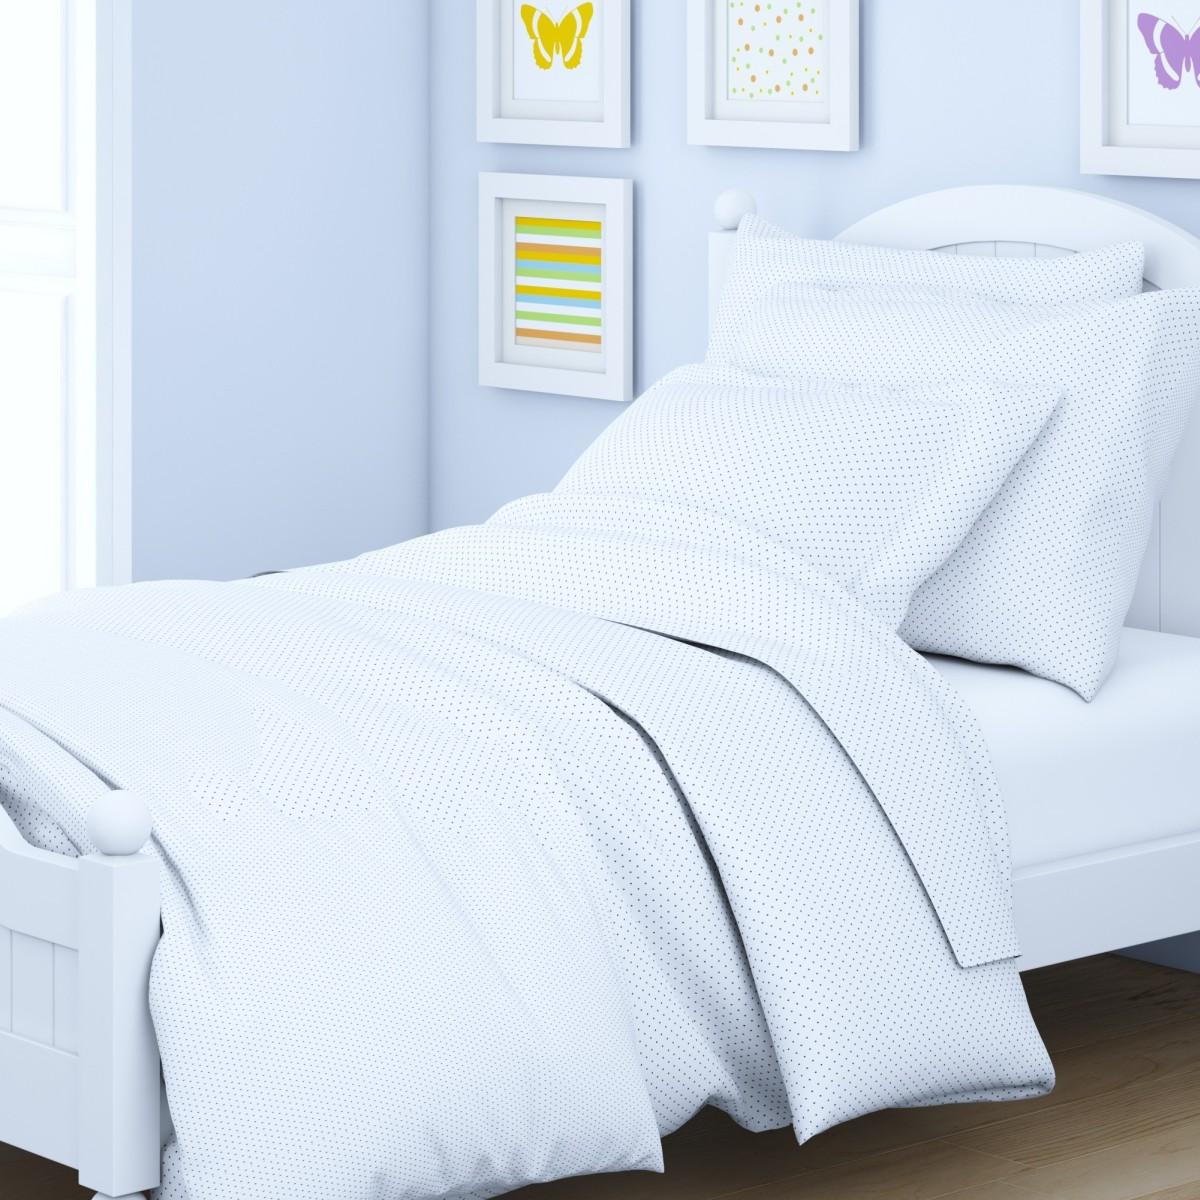 Letto Комплект в кроватку Ясли 3 предмета BG-78, Letto Home Textile